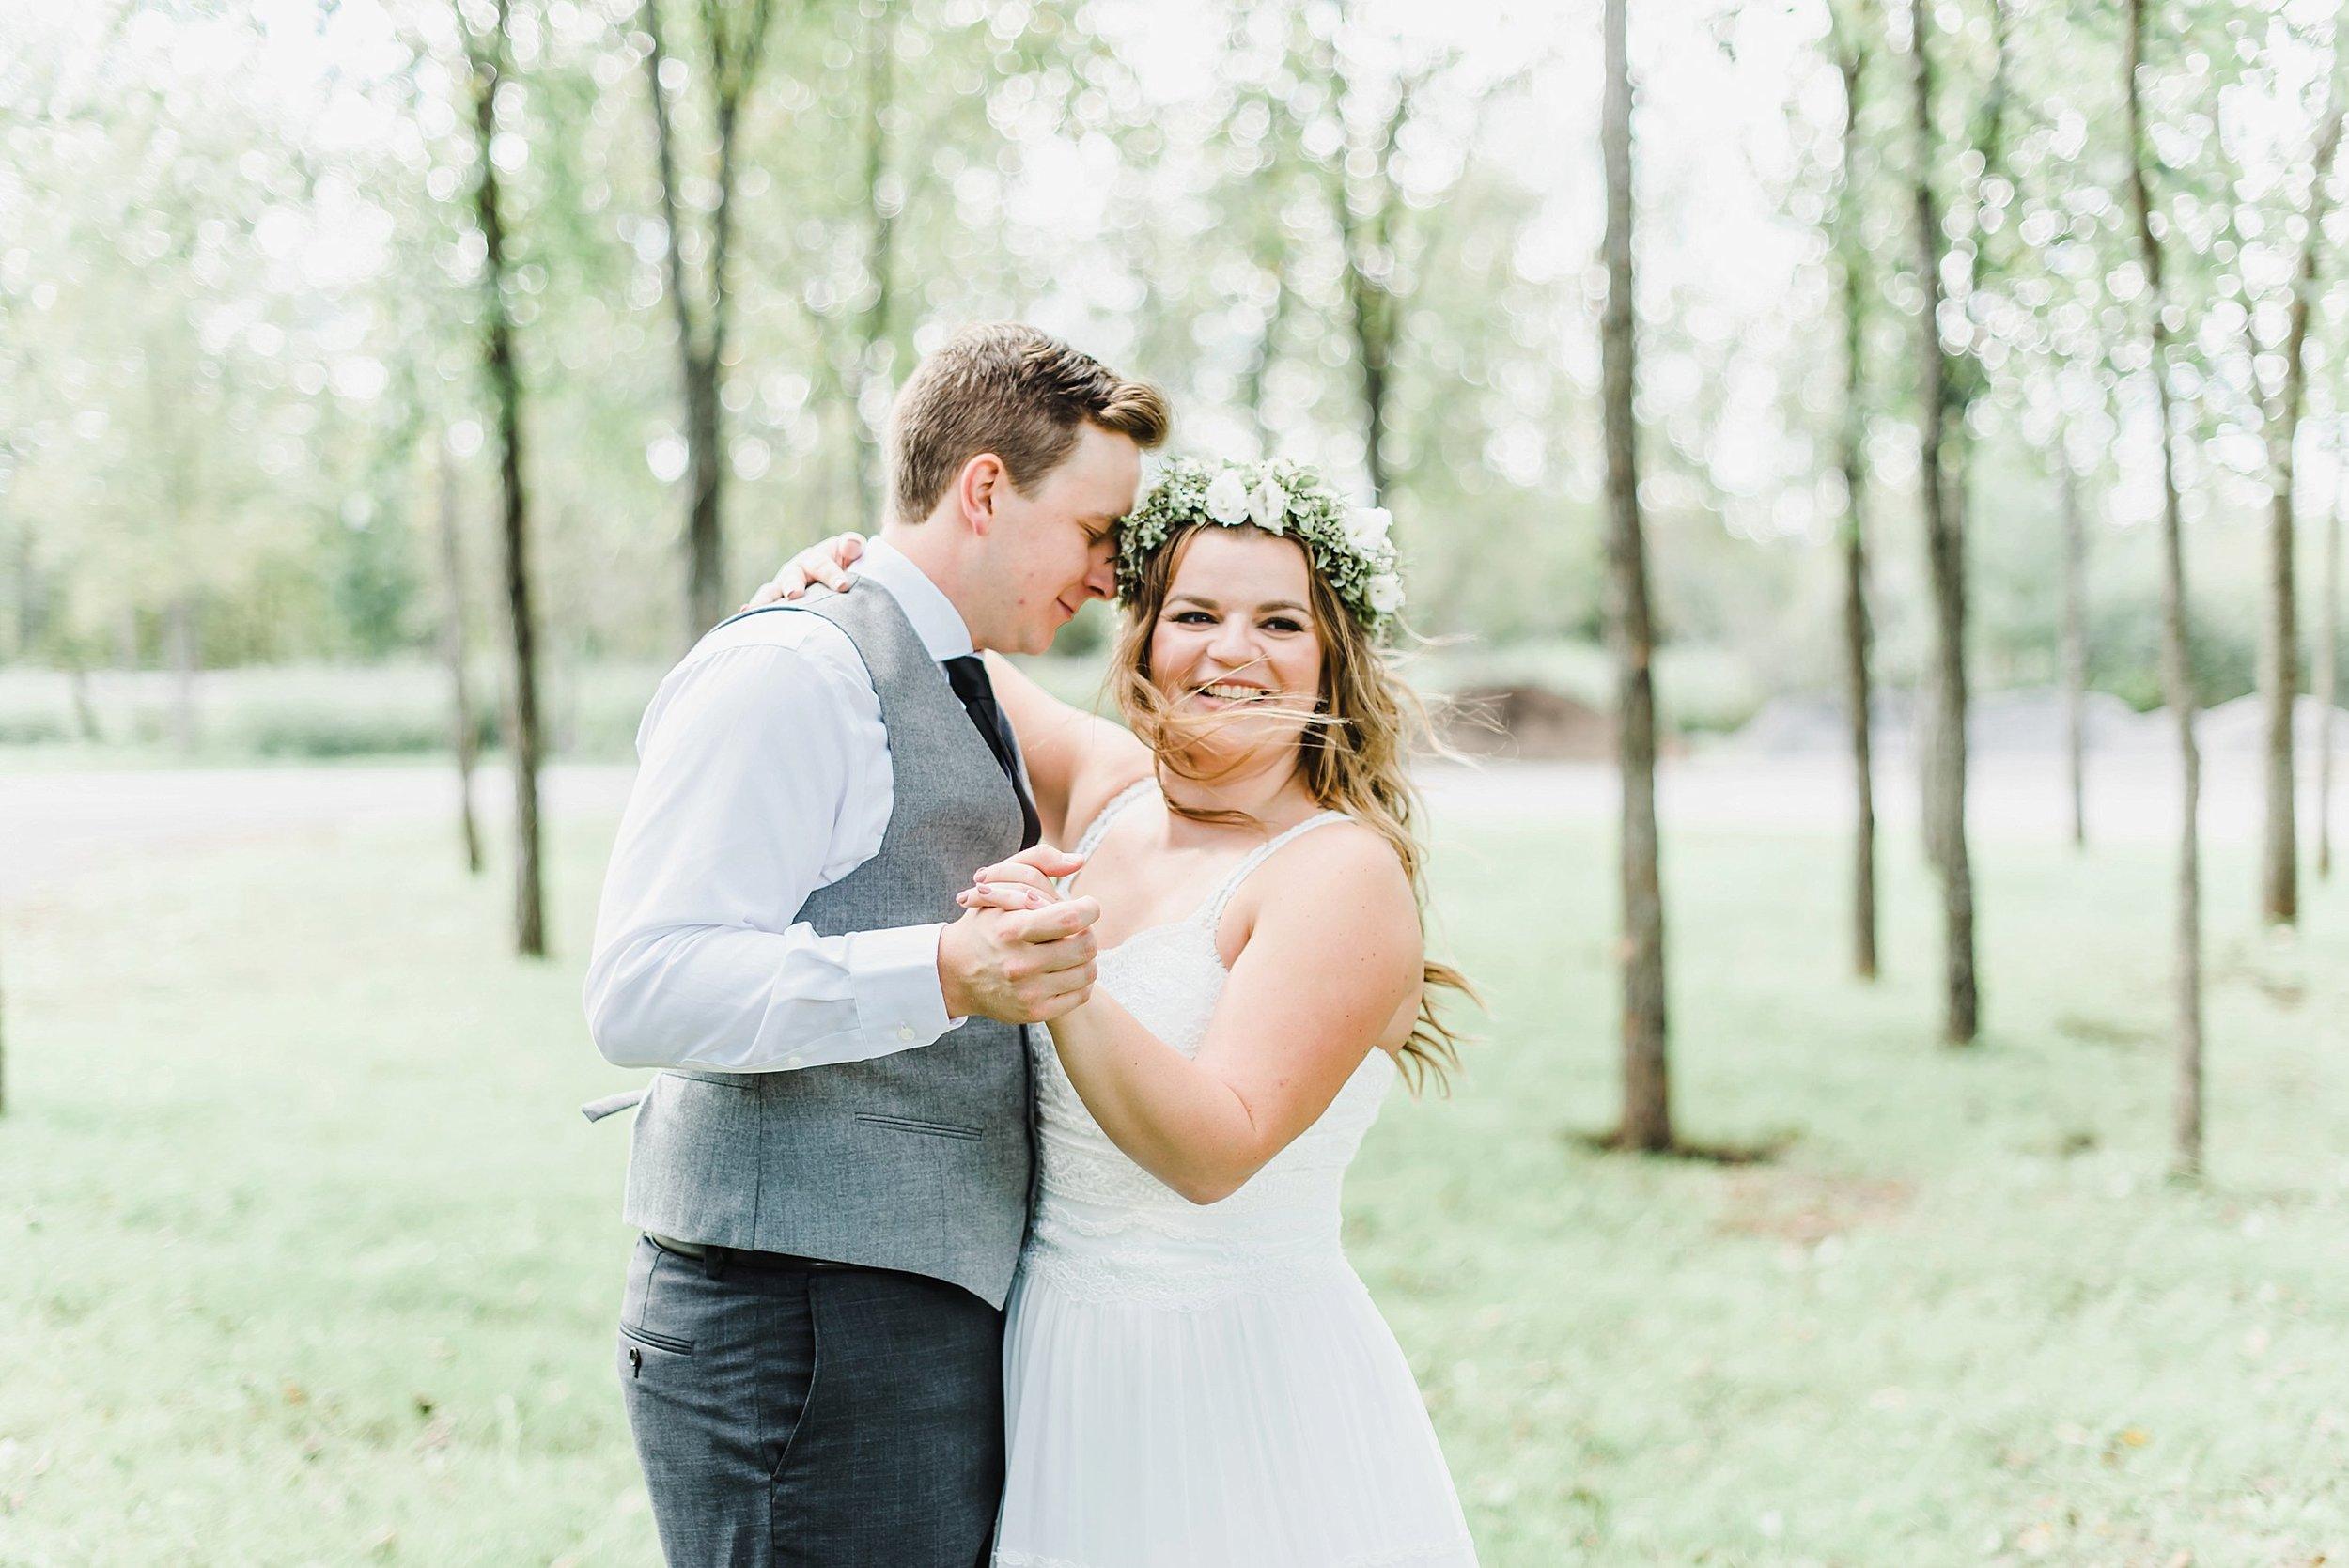 light airy indie fine art ottawa wedding photographer | Ali and Batoul Photography_1117.jpg